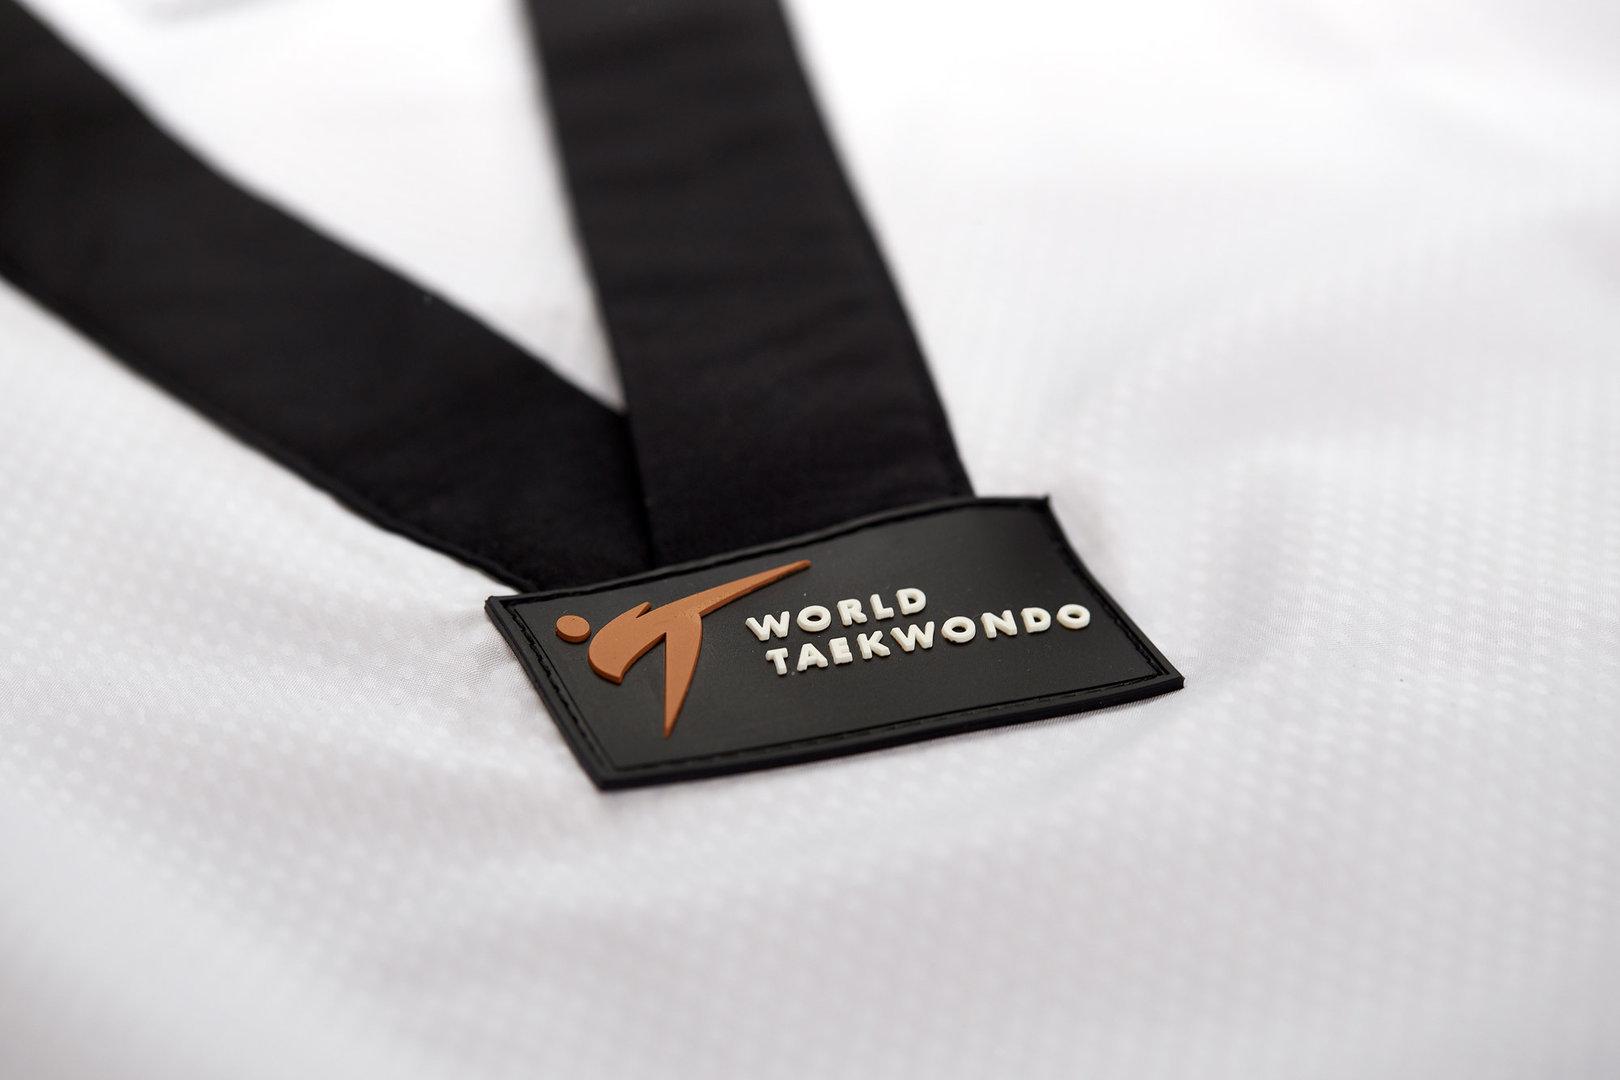 adidas Taekwondoanzug Fighter Damen ohne Streifen, schwarzes